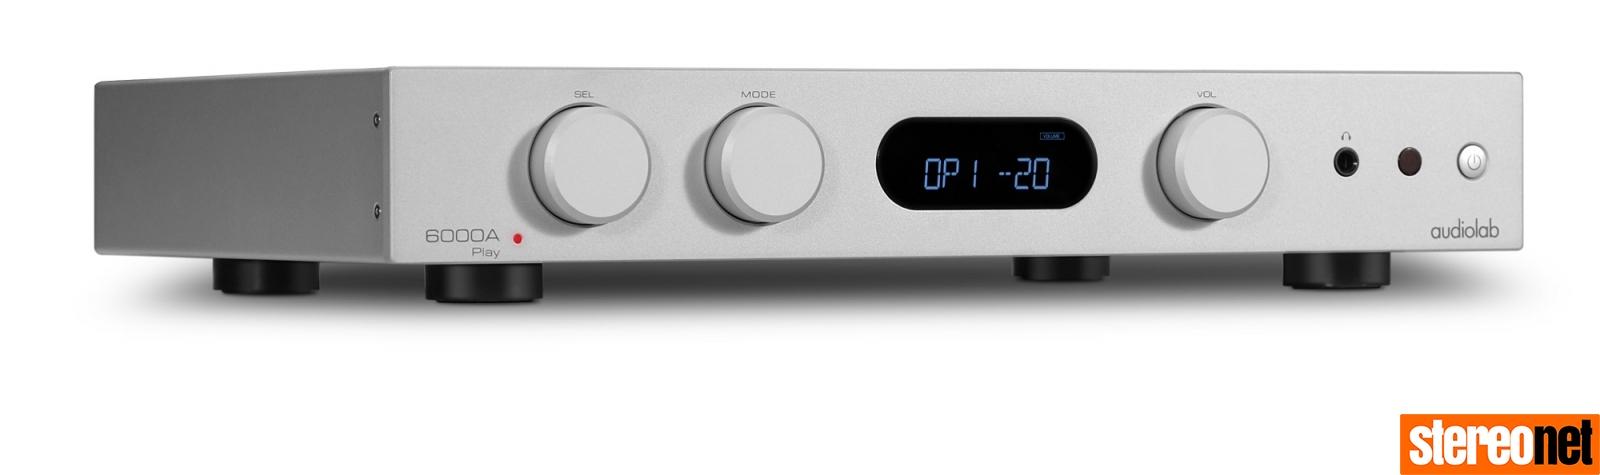 Audiolab 6000A Play uk hi-fi news